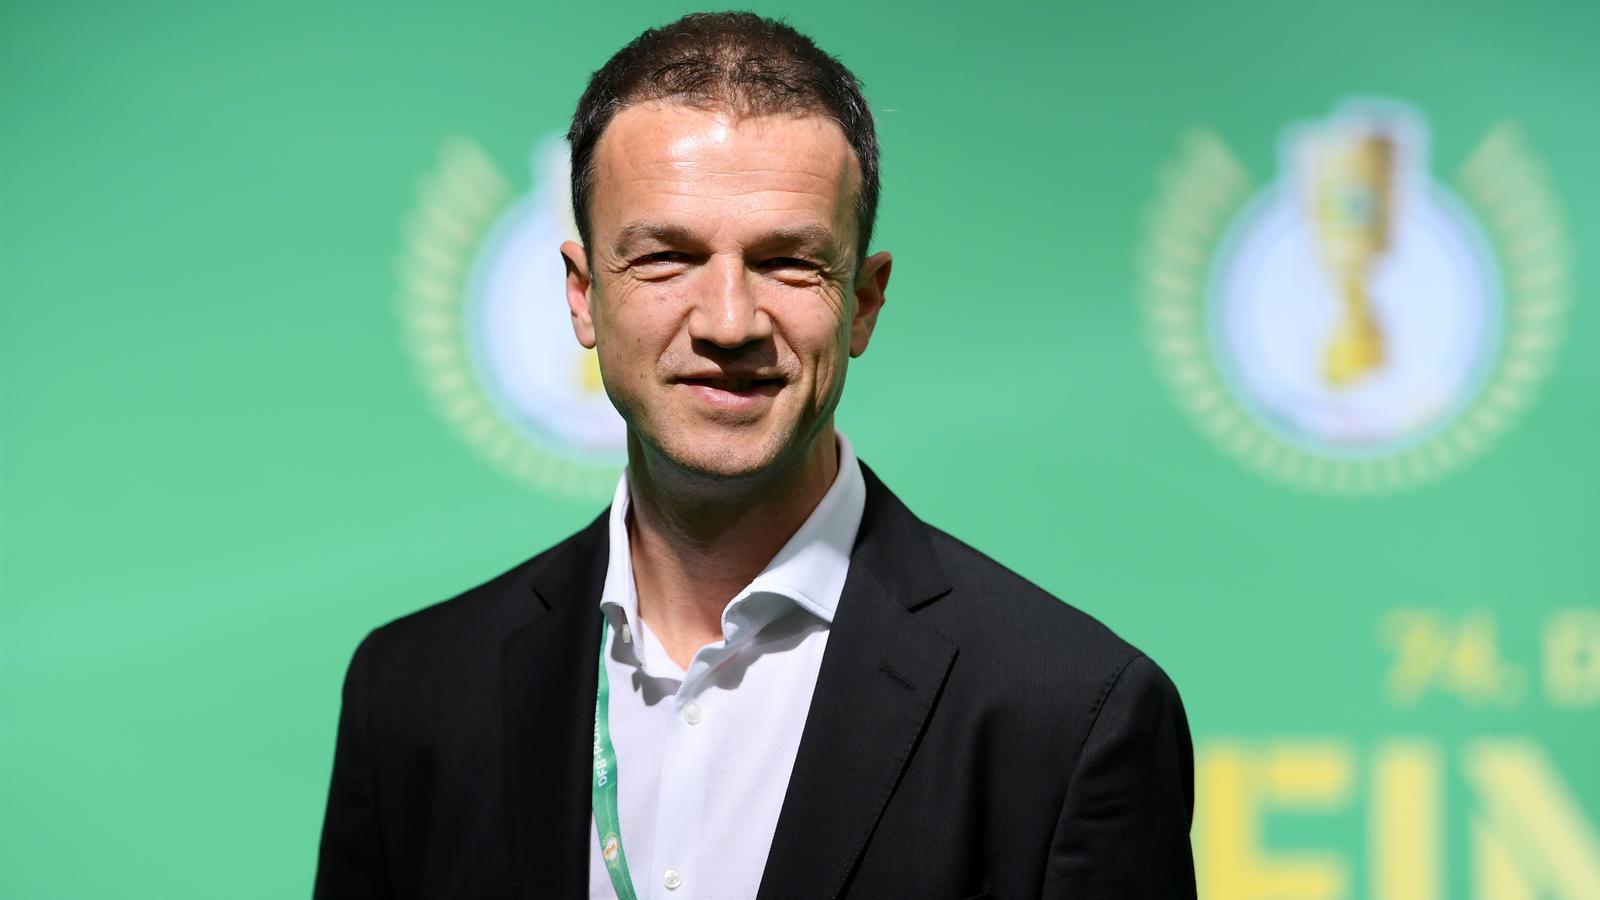 Green Carpet - DFB Cup Final 2017